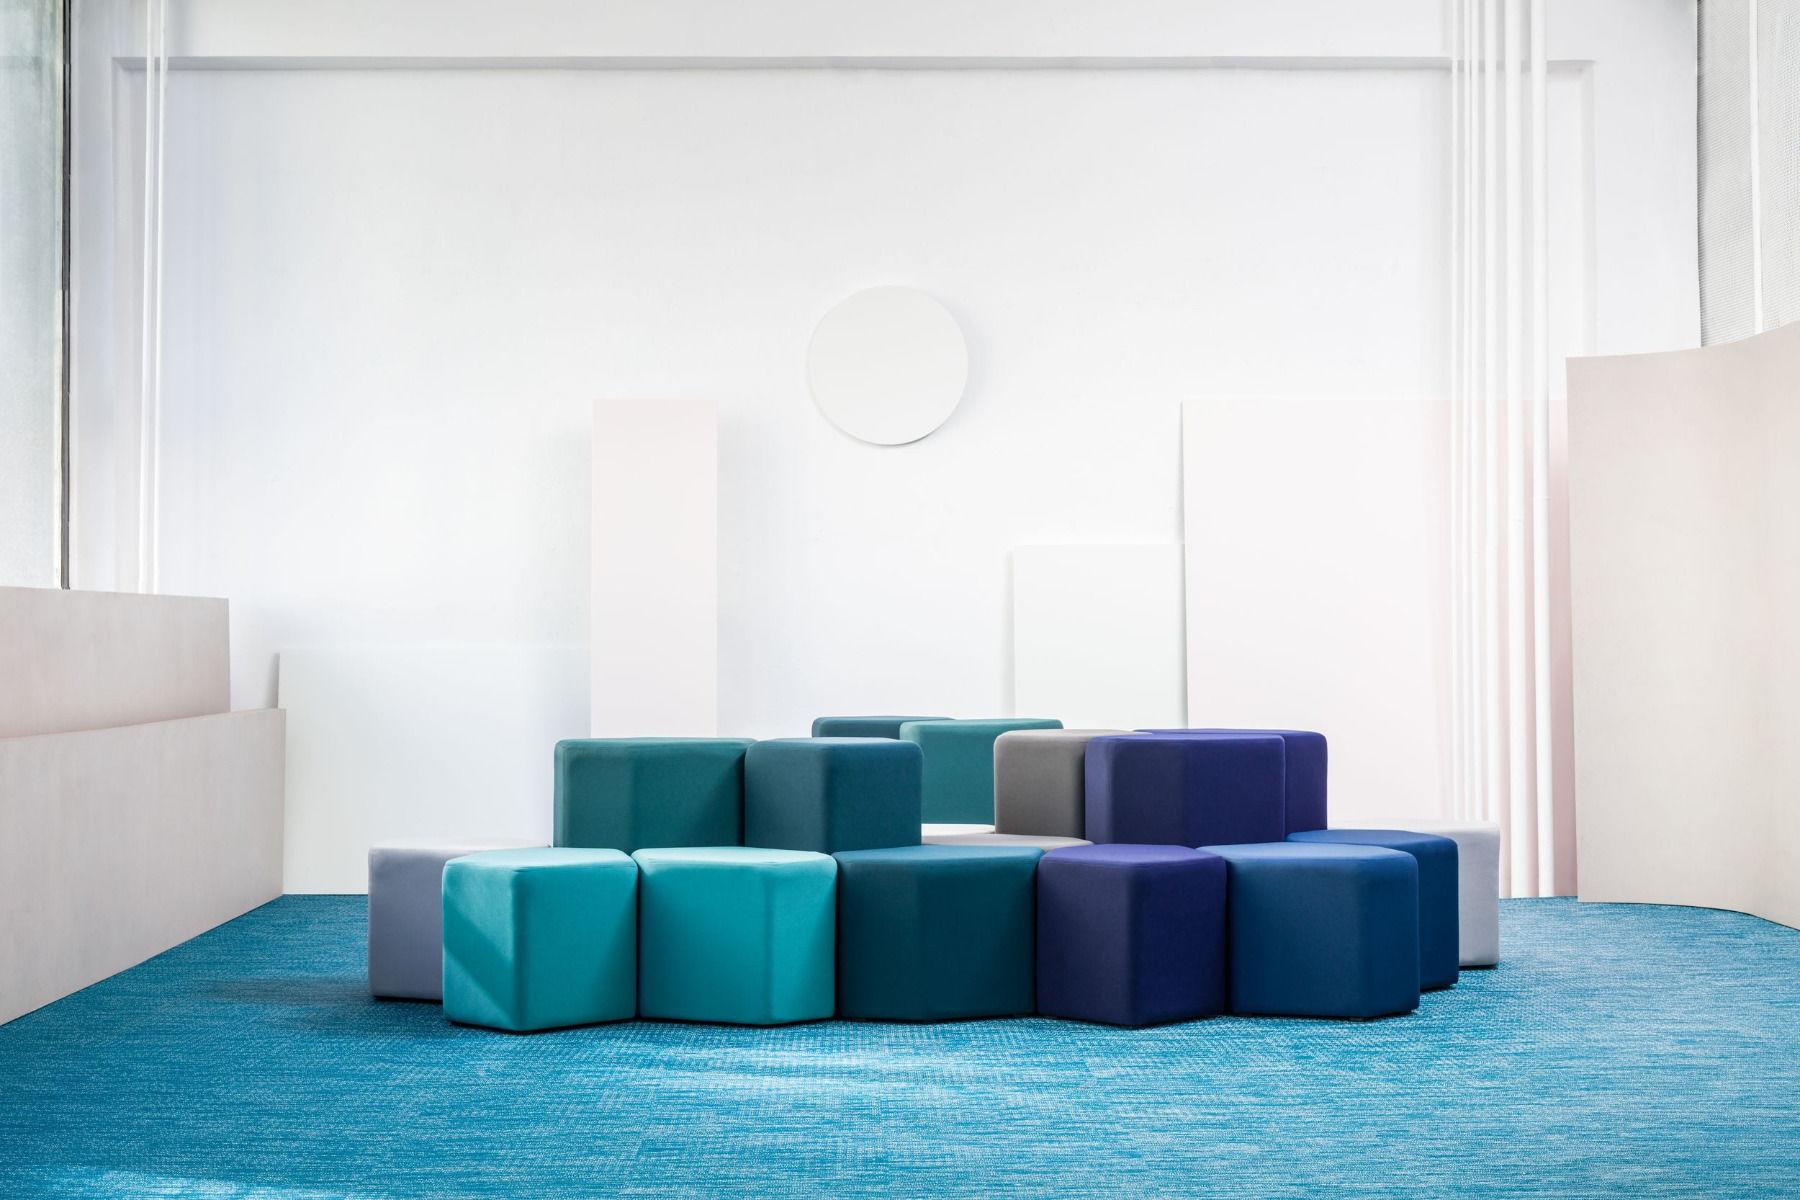 empfangstheken-sitzmoebel-lounge-museum-hellblau-lila-front